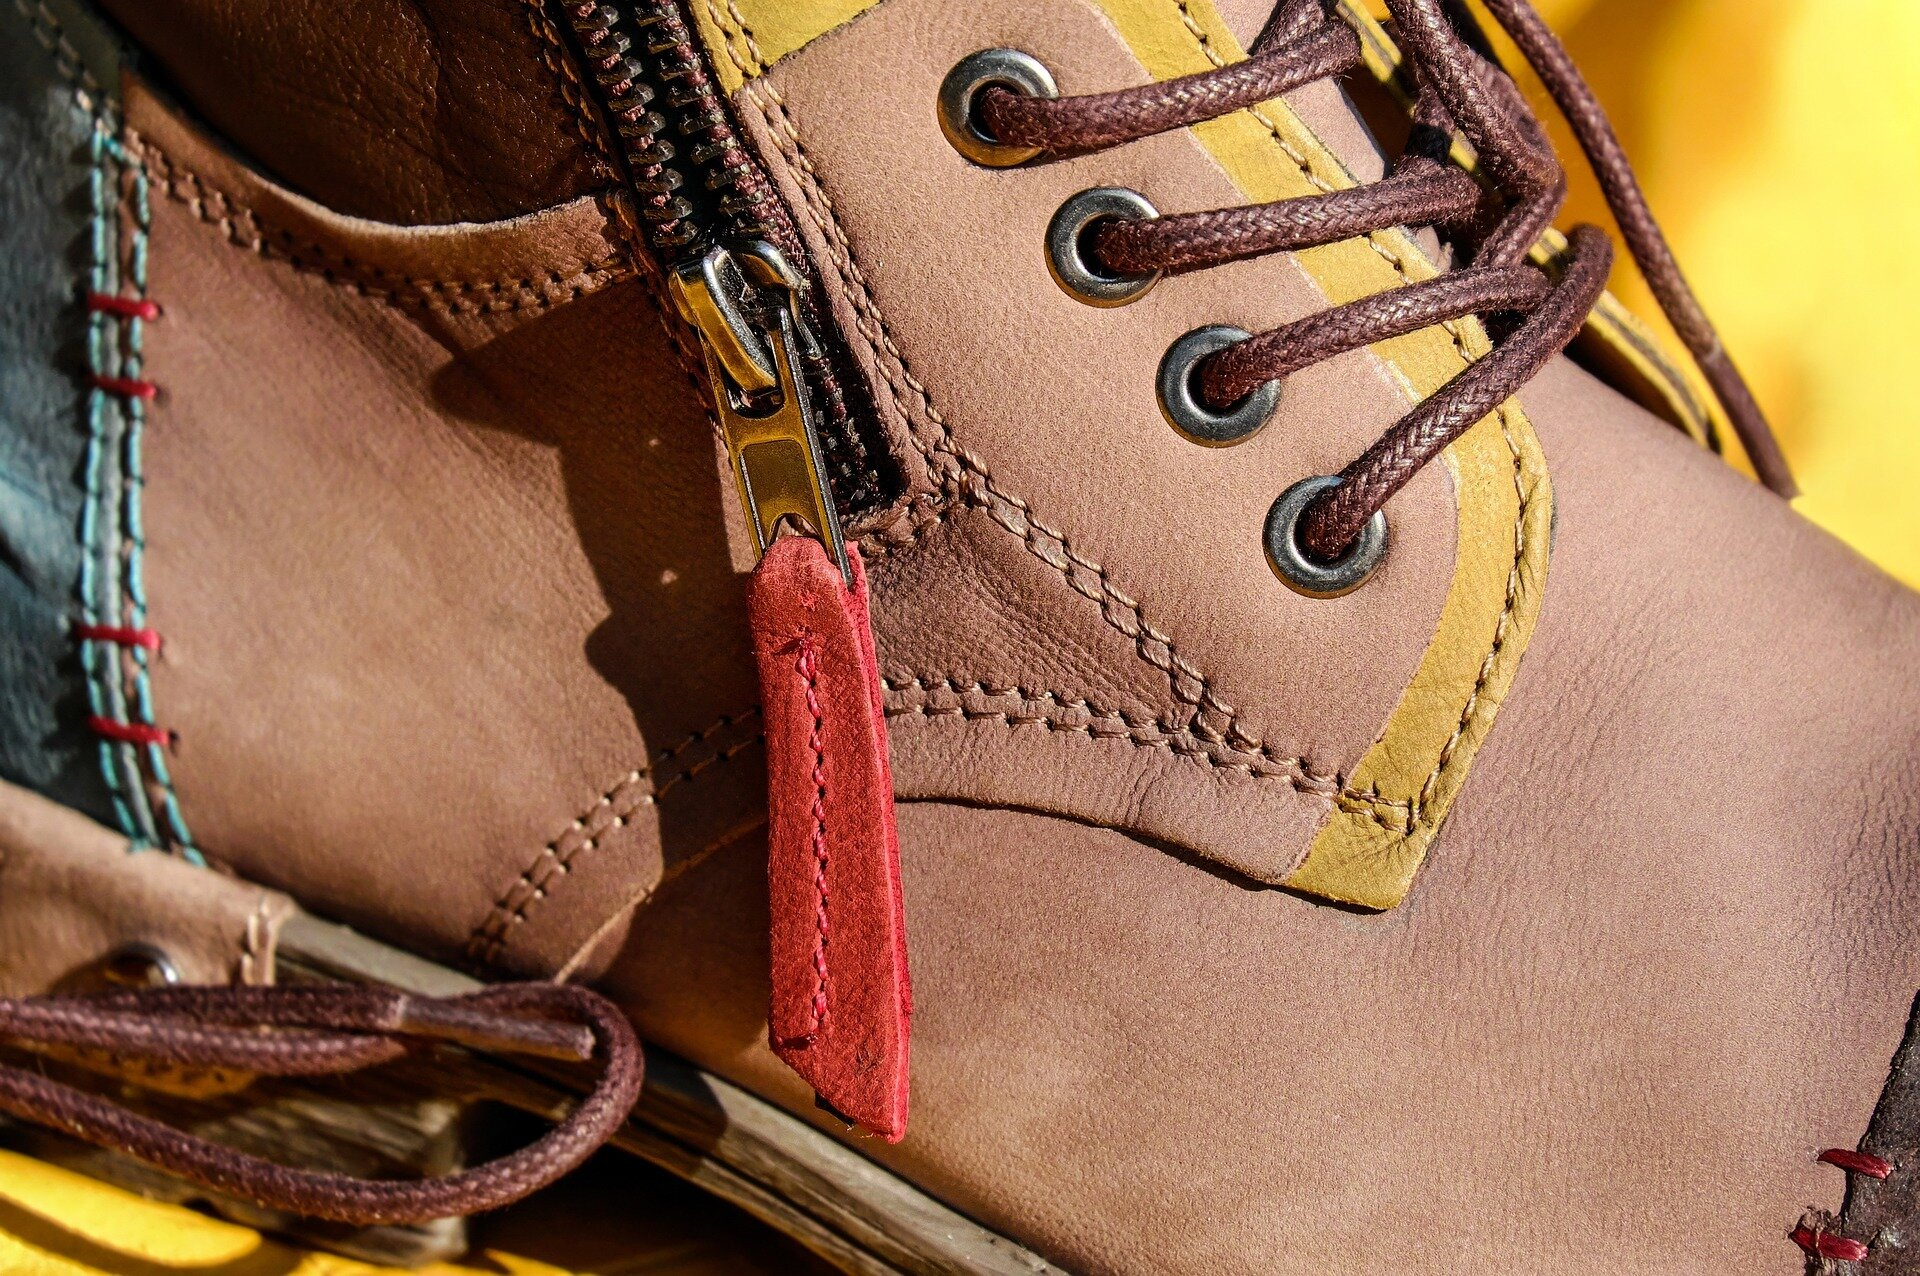 shoe-1708632_1920